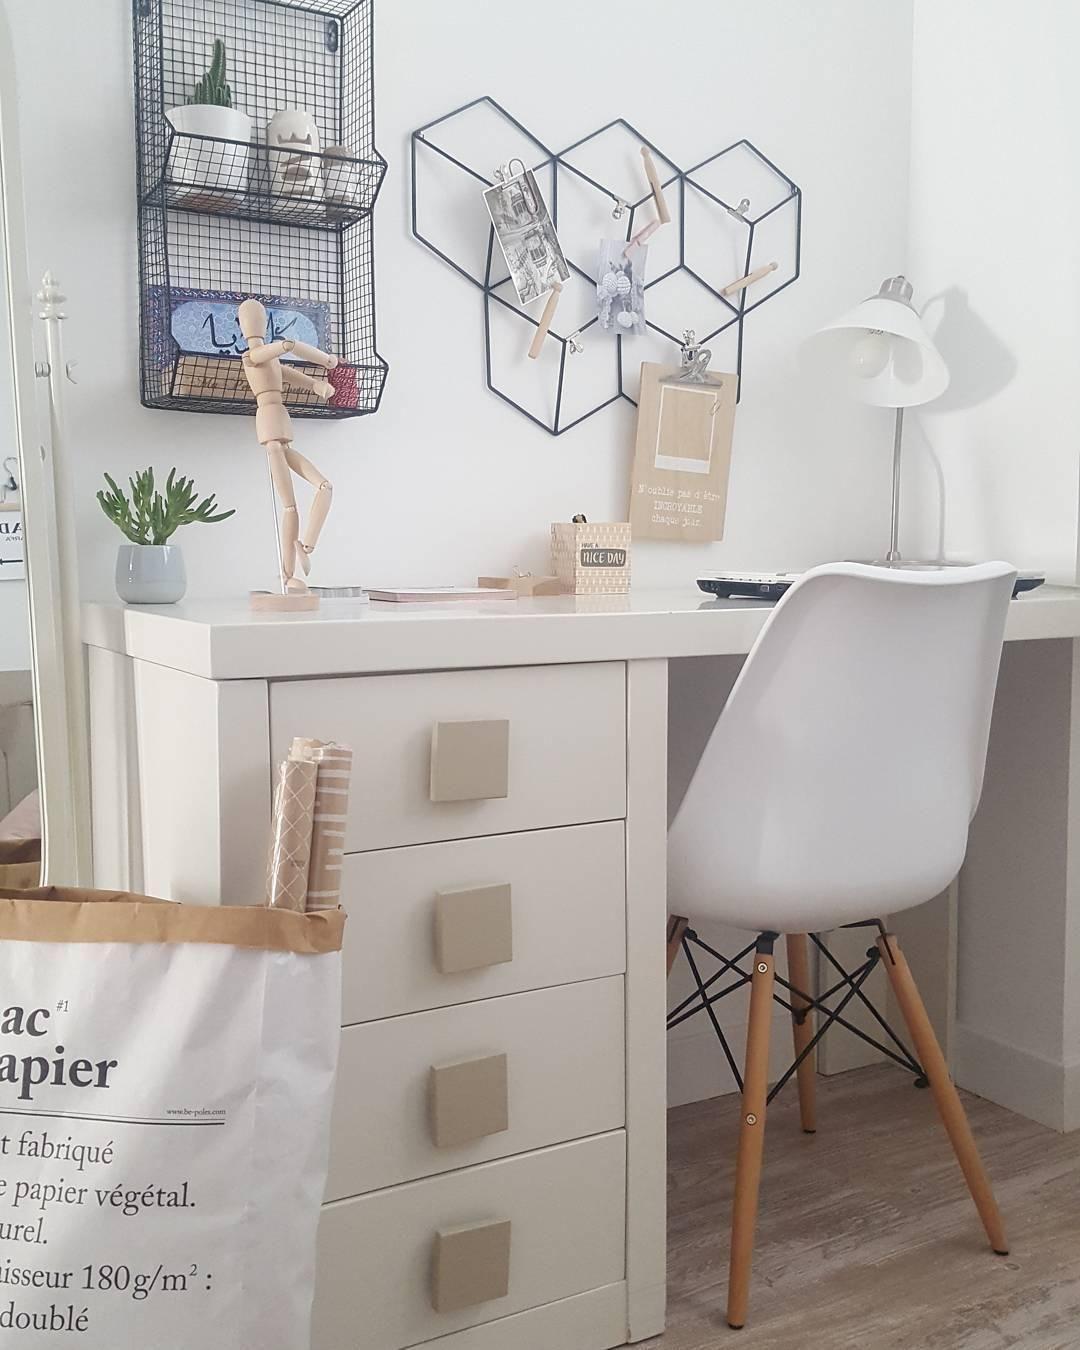 aufbewahrungst ten le sac en papier 2 st ck pinterest papiert ten verstauen und. Black Bedroom Furniture Sets. Home Design Ideas